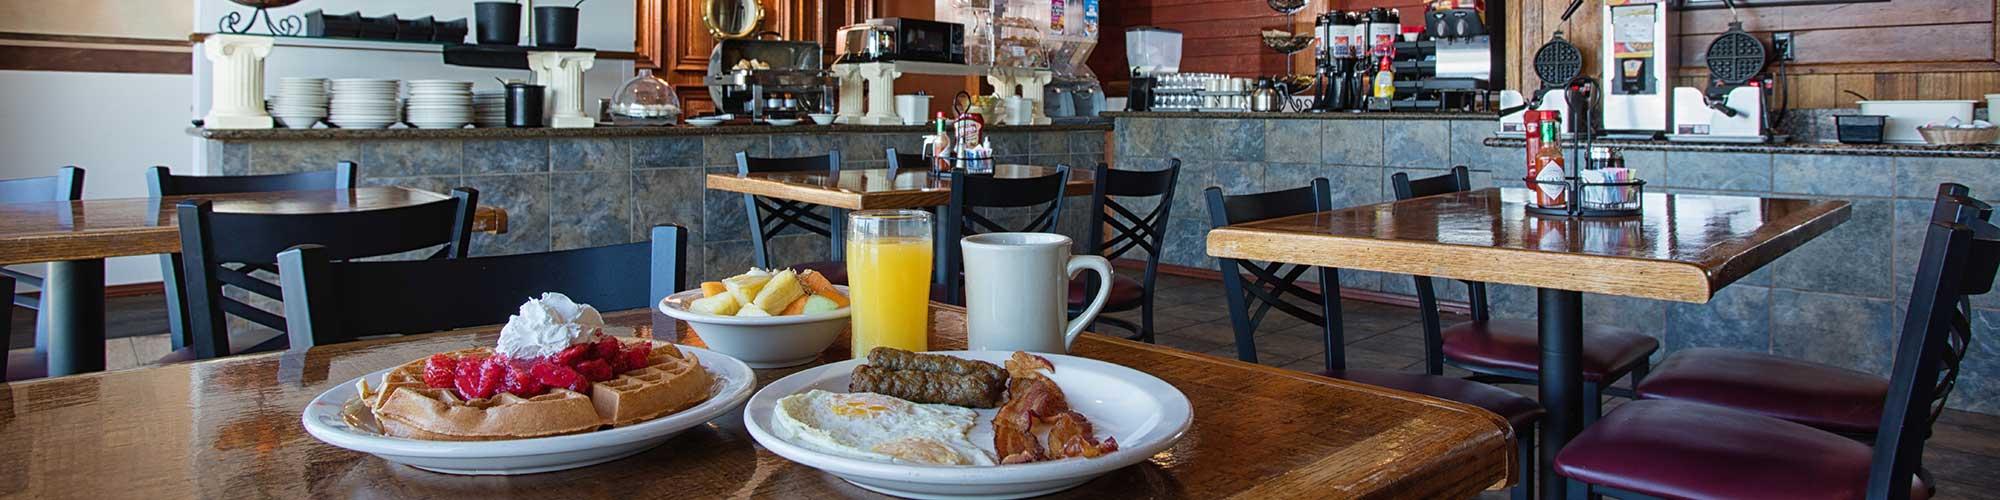 Clover Island Inn free breakfast